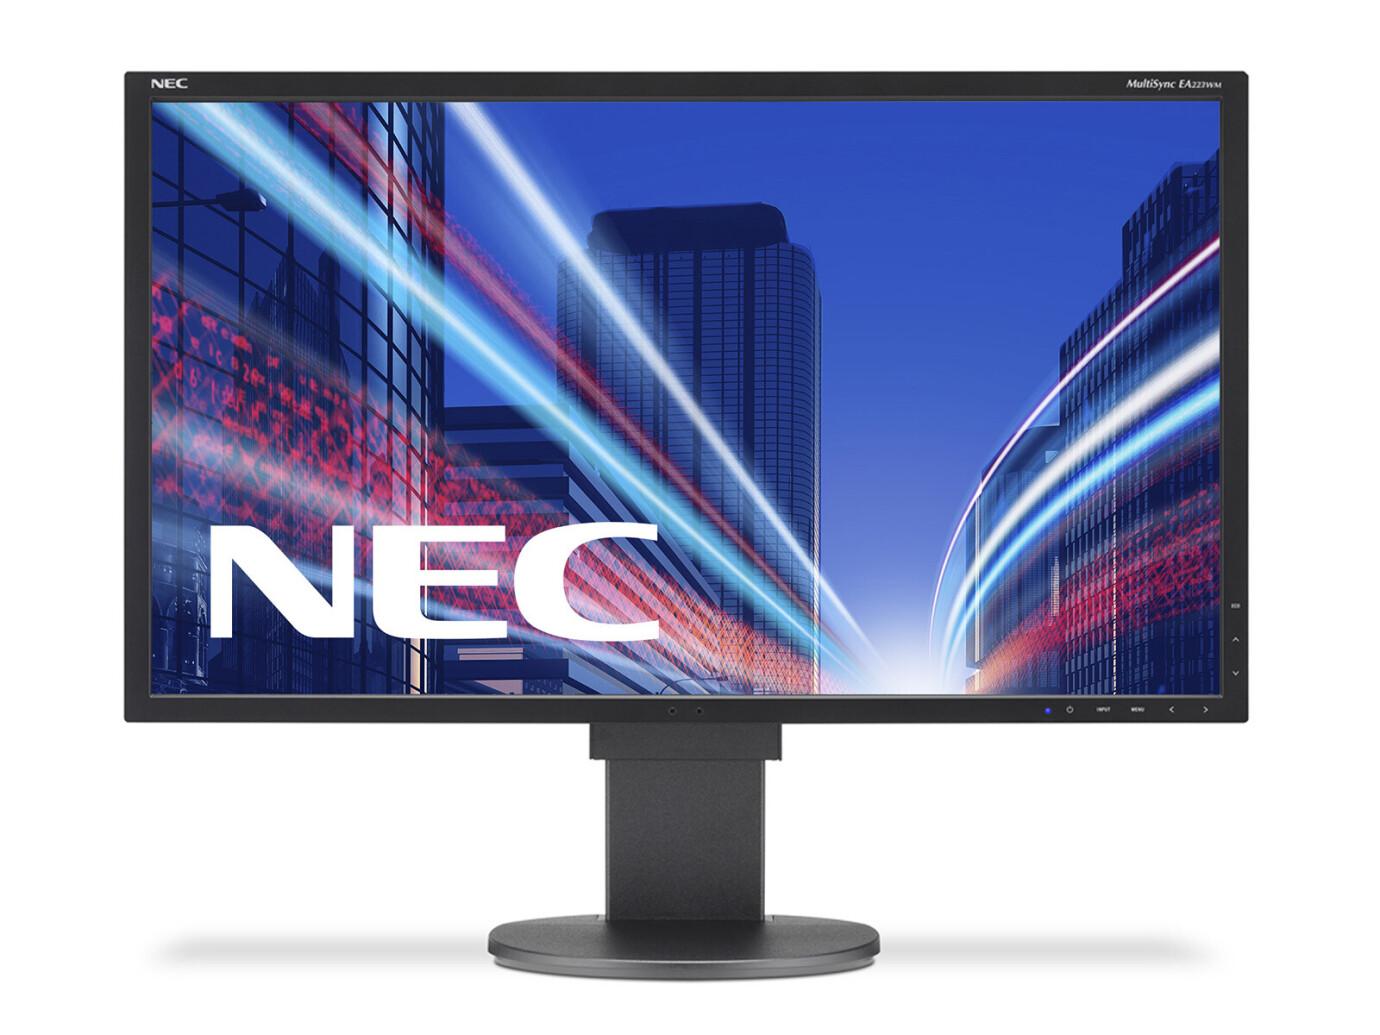 "NEC MultiSync EA223WM, schwarz 22"" LCD Monitor mit WSXGA+ und 5ms"